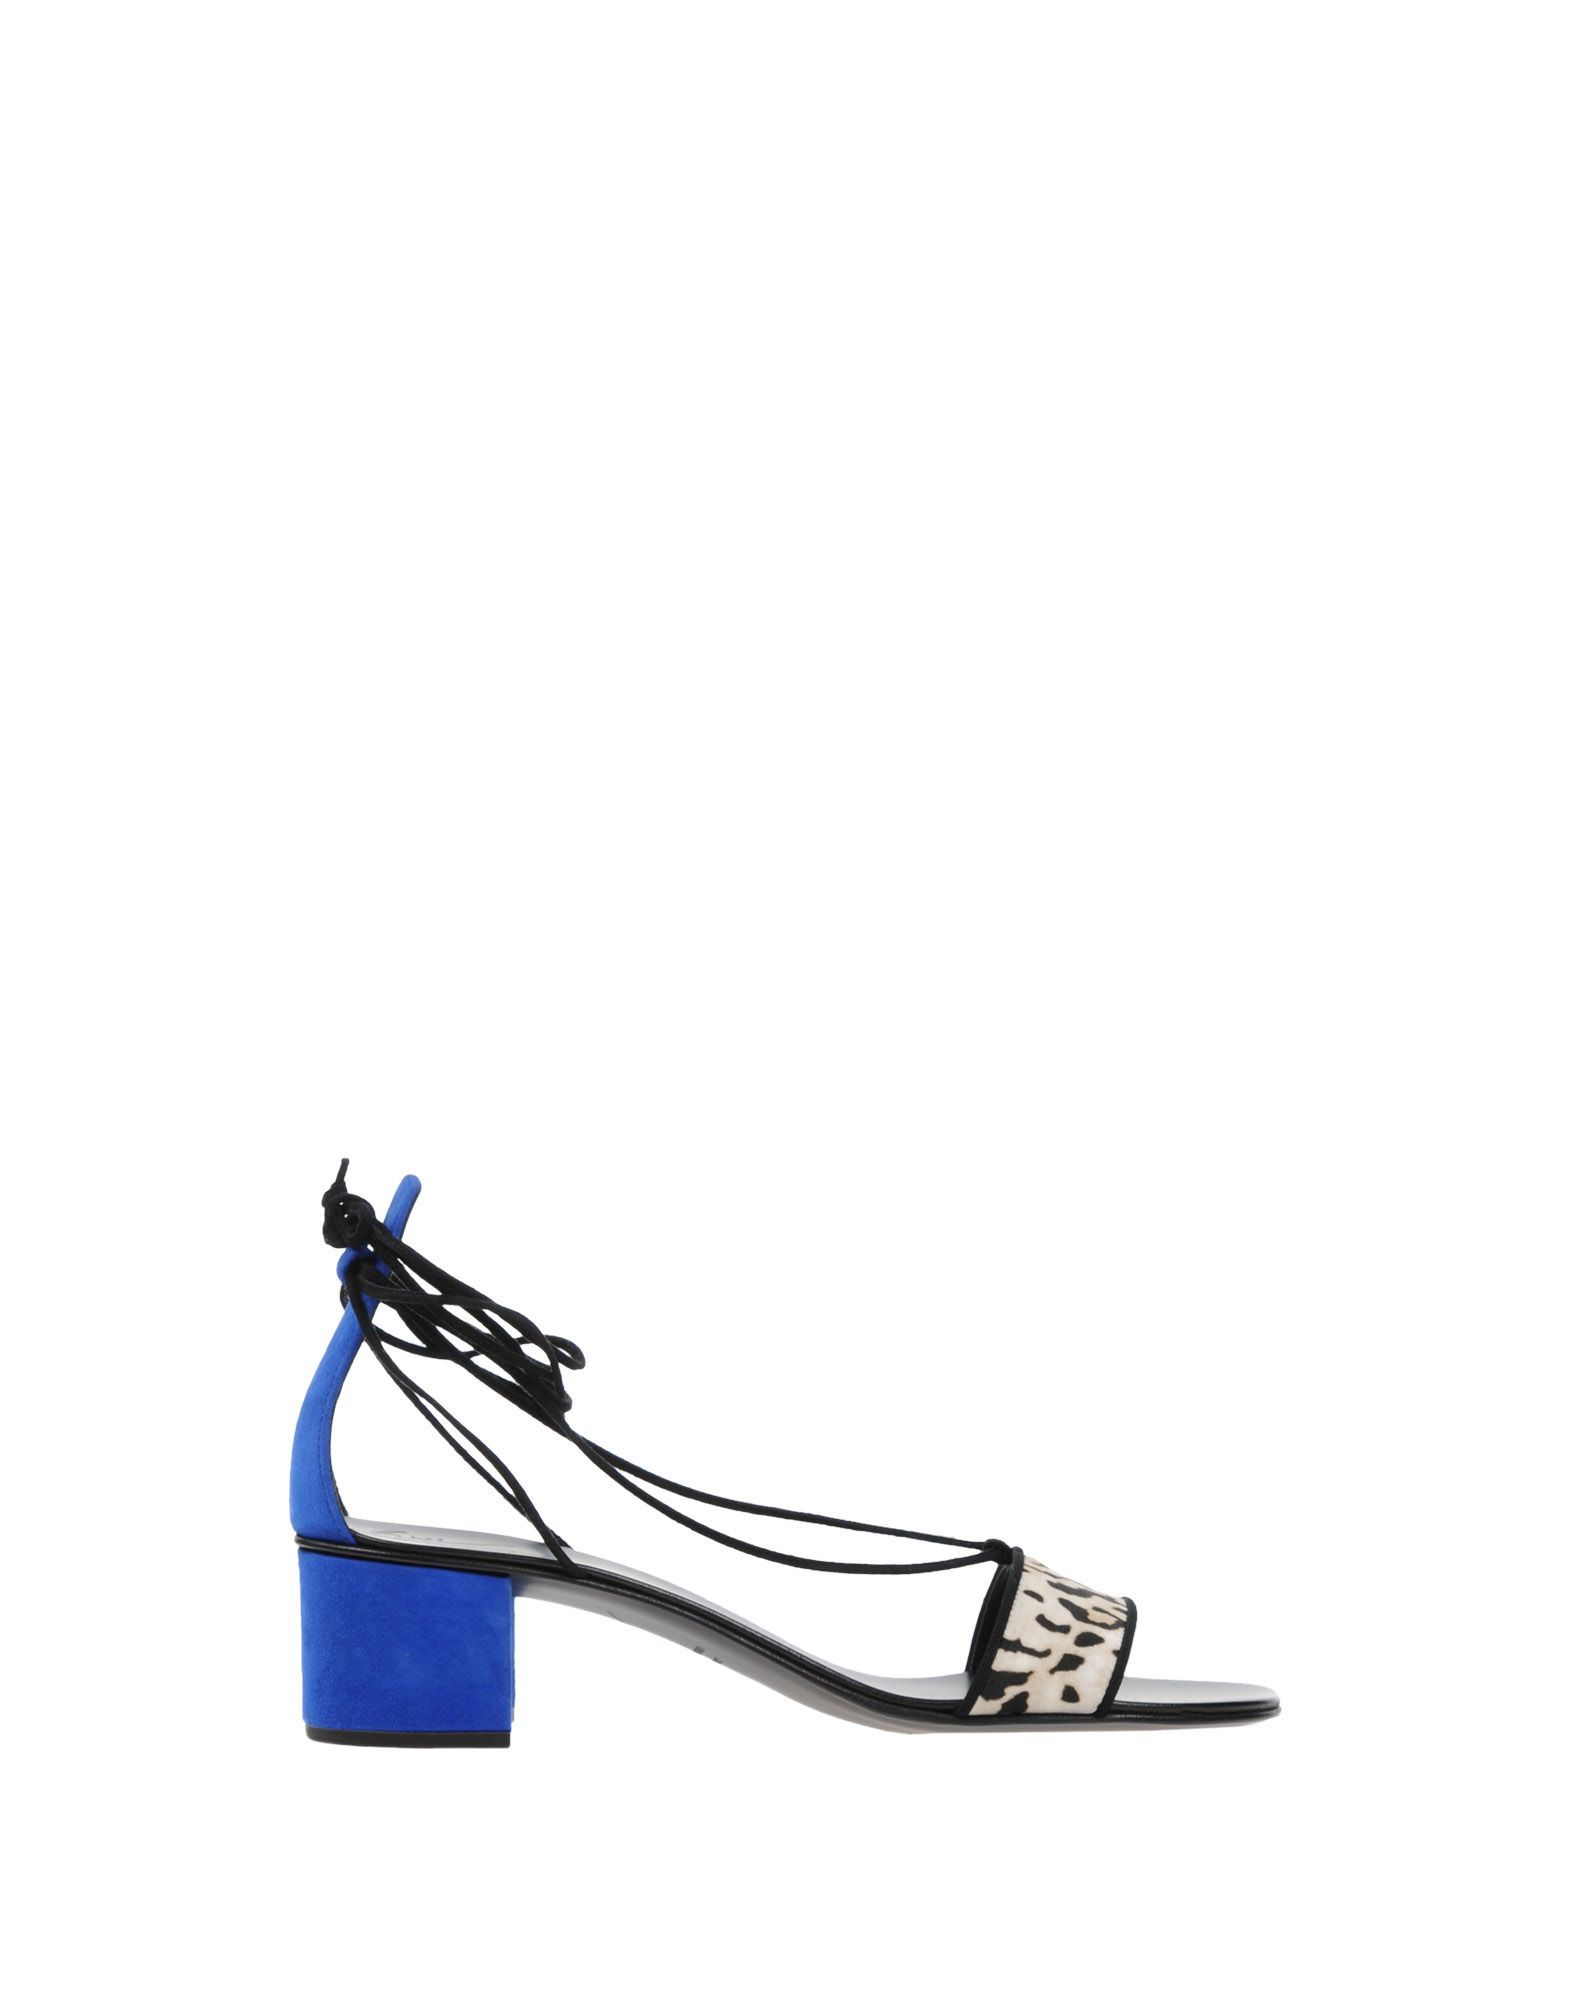 Giuseppe Zanotti Sandalen Damen   Damen 11404155DA Beliebte Schuhe c345e6